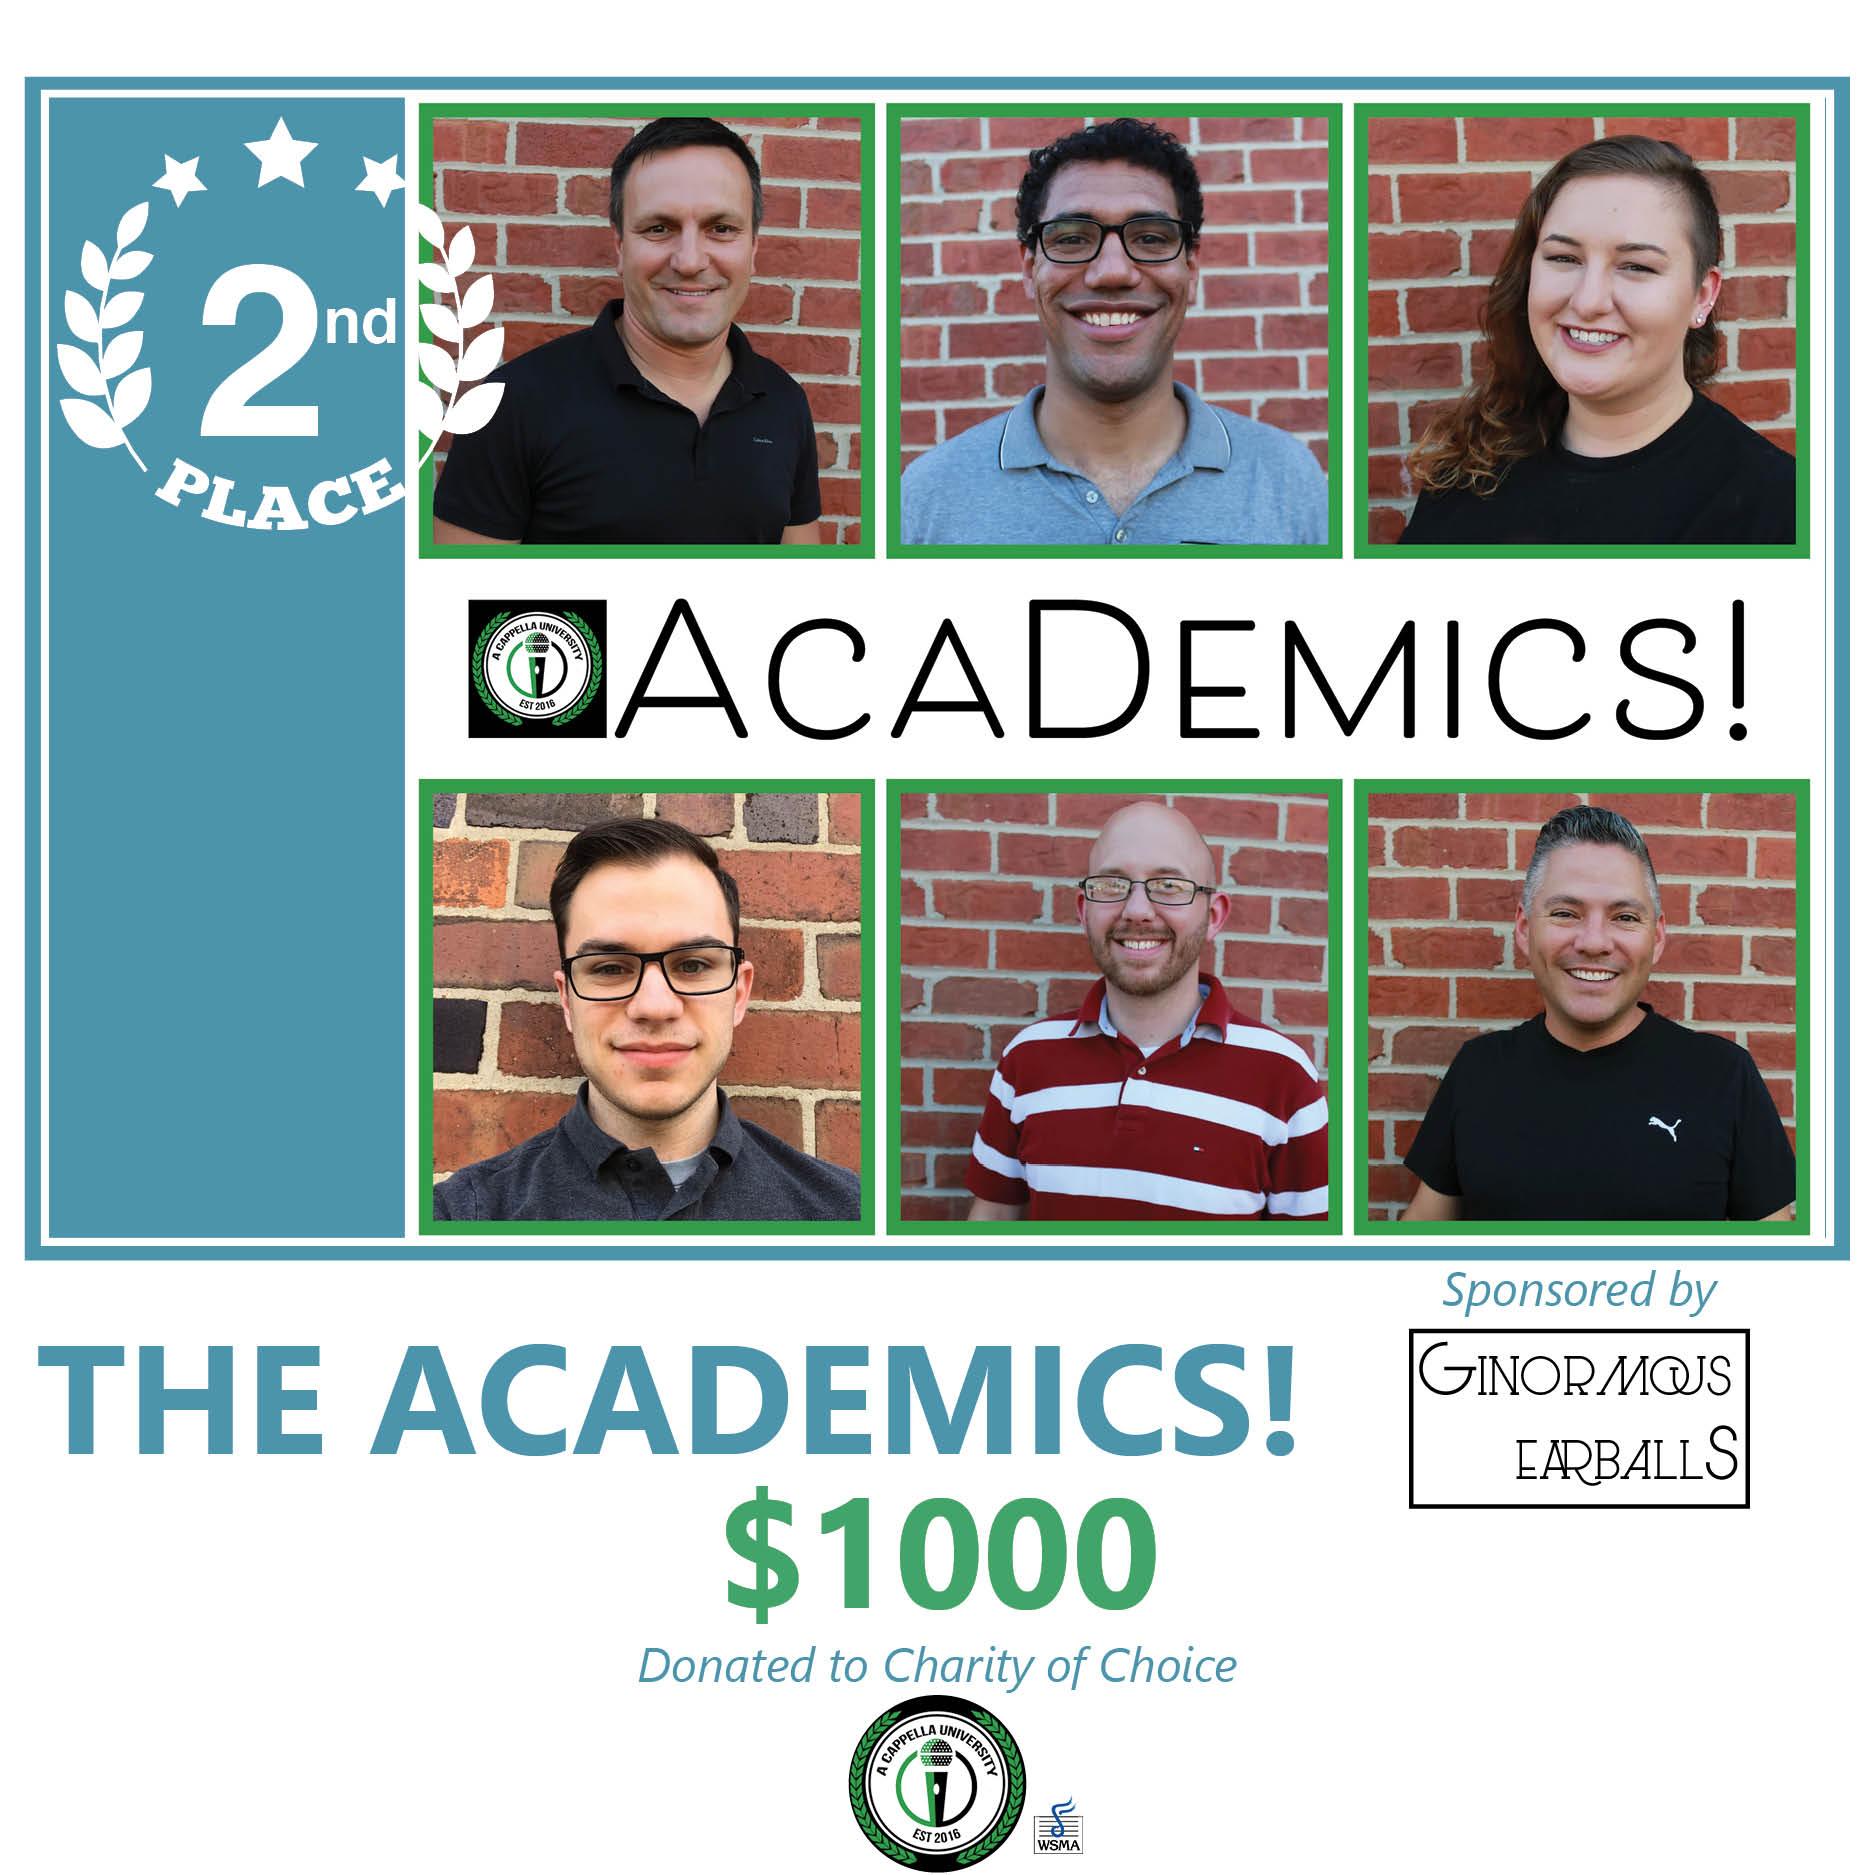 2019 BOTIB Winners_The Academics_GatheringontheGreen